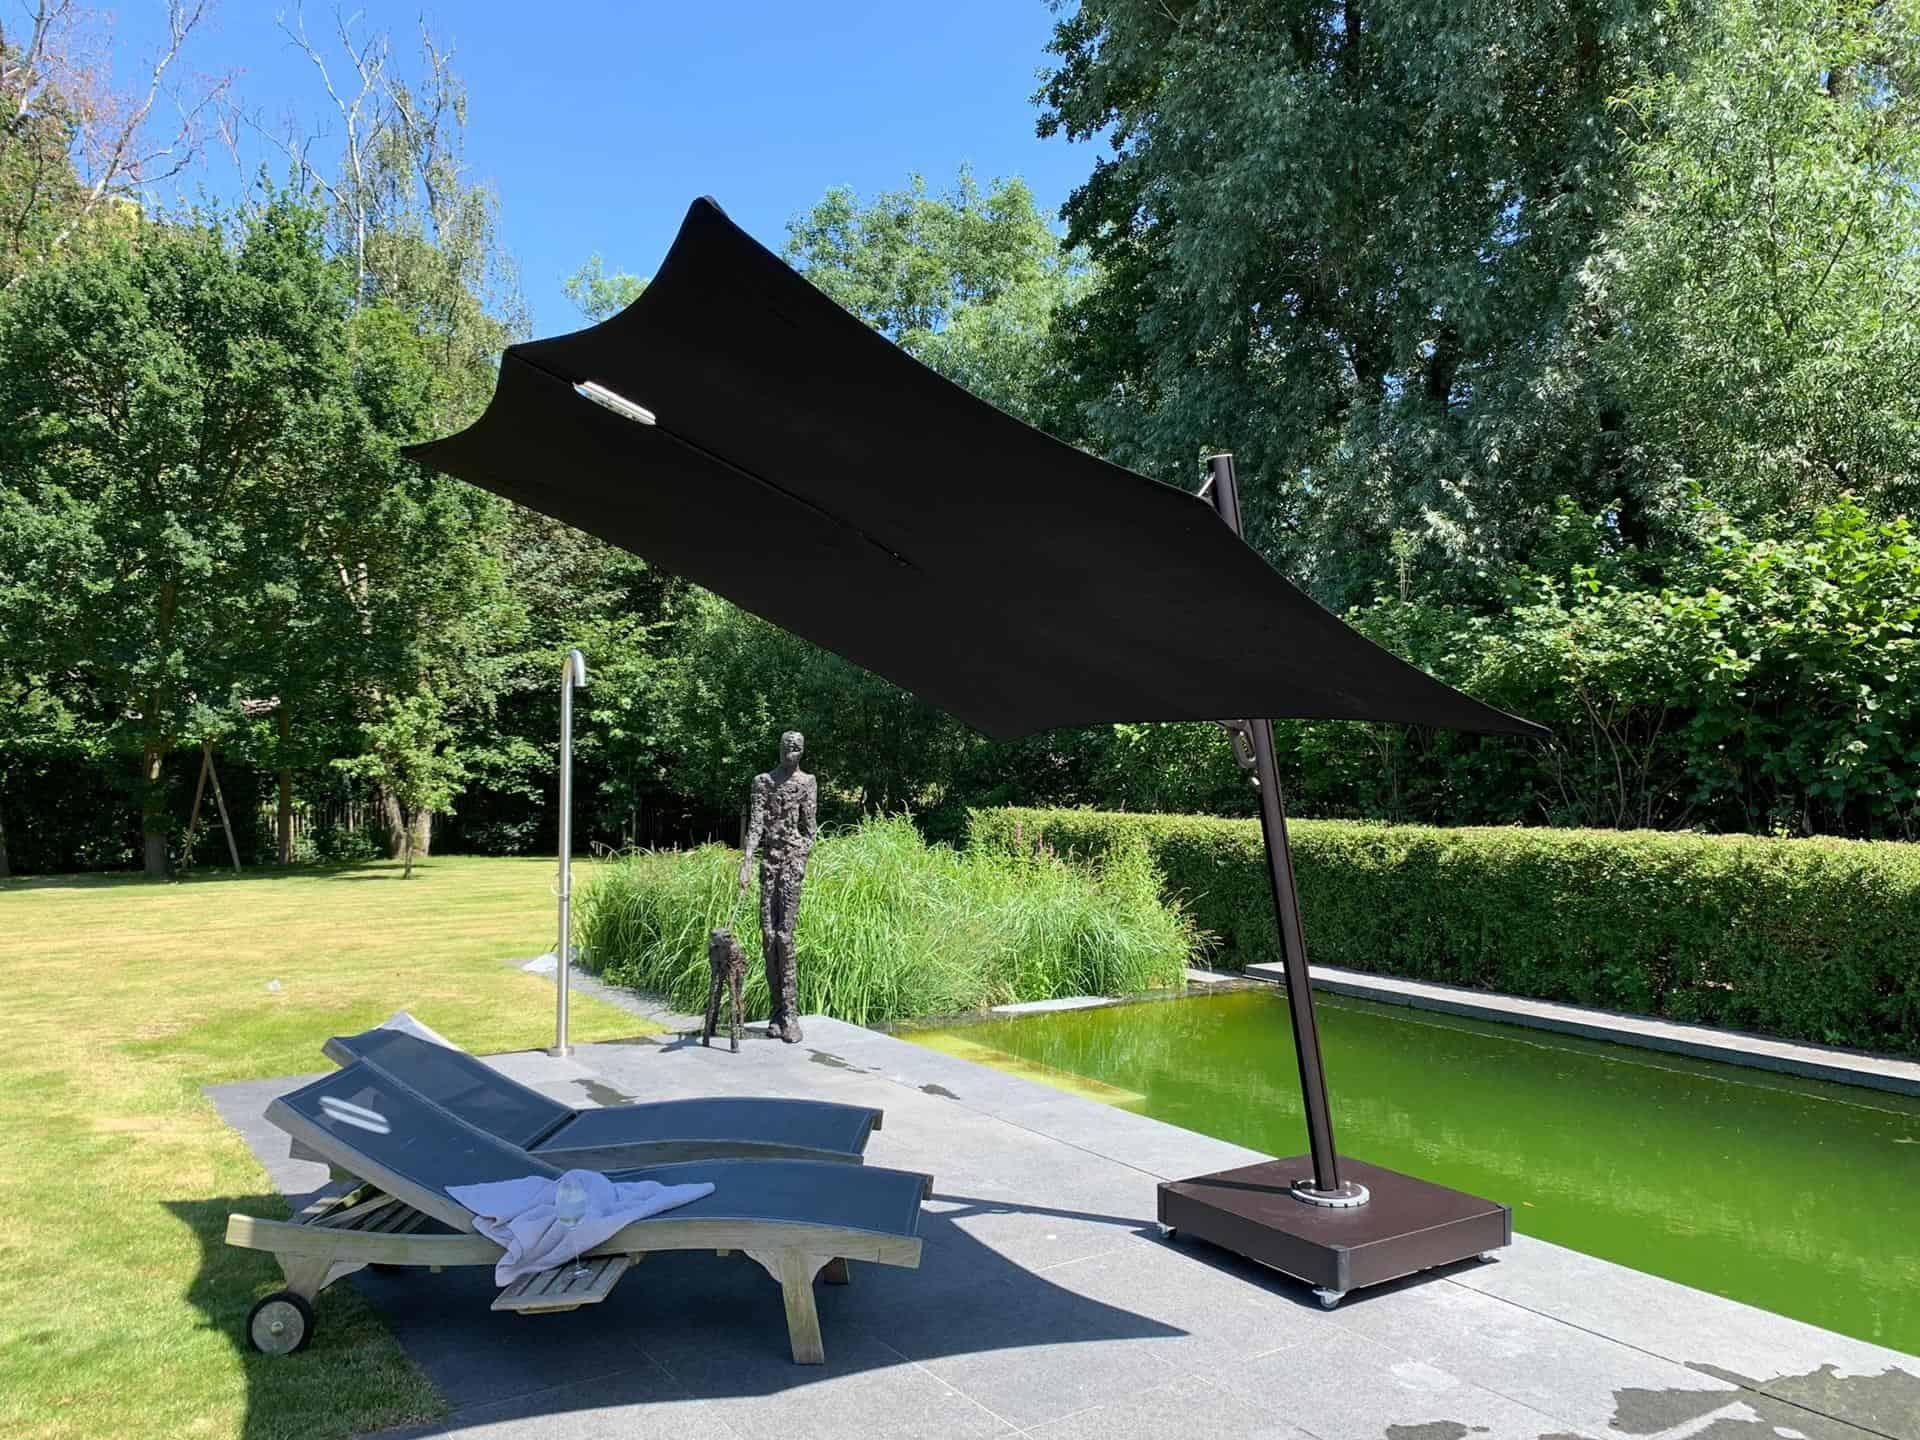 Spectra cantilever umbrella Multibat13_1.jpg